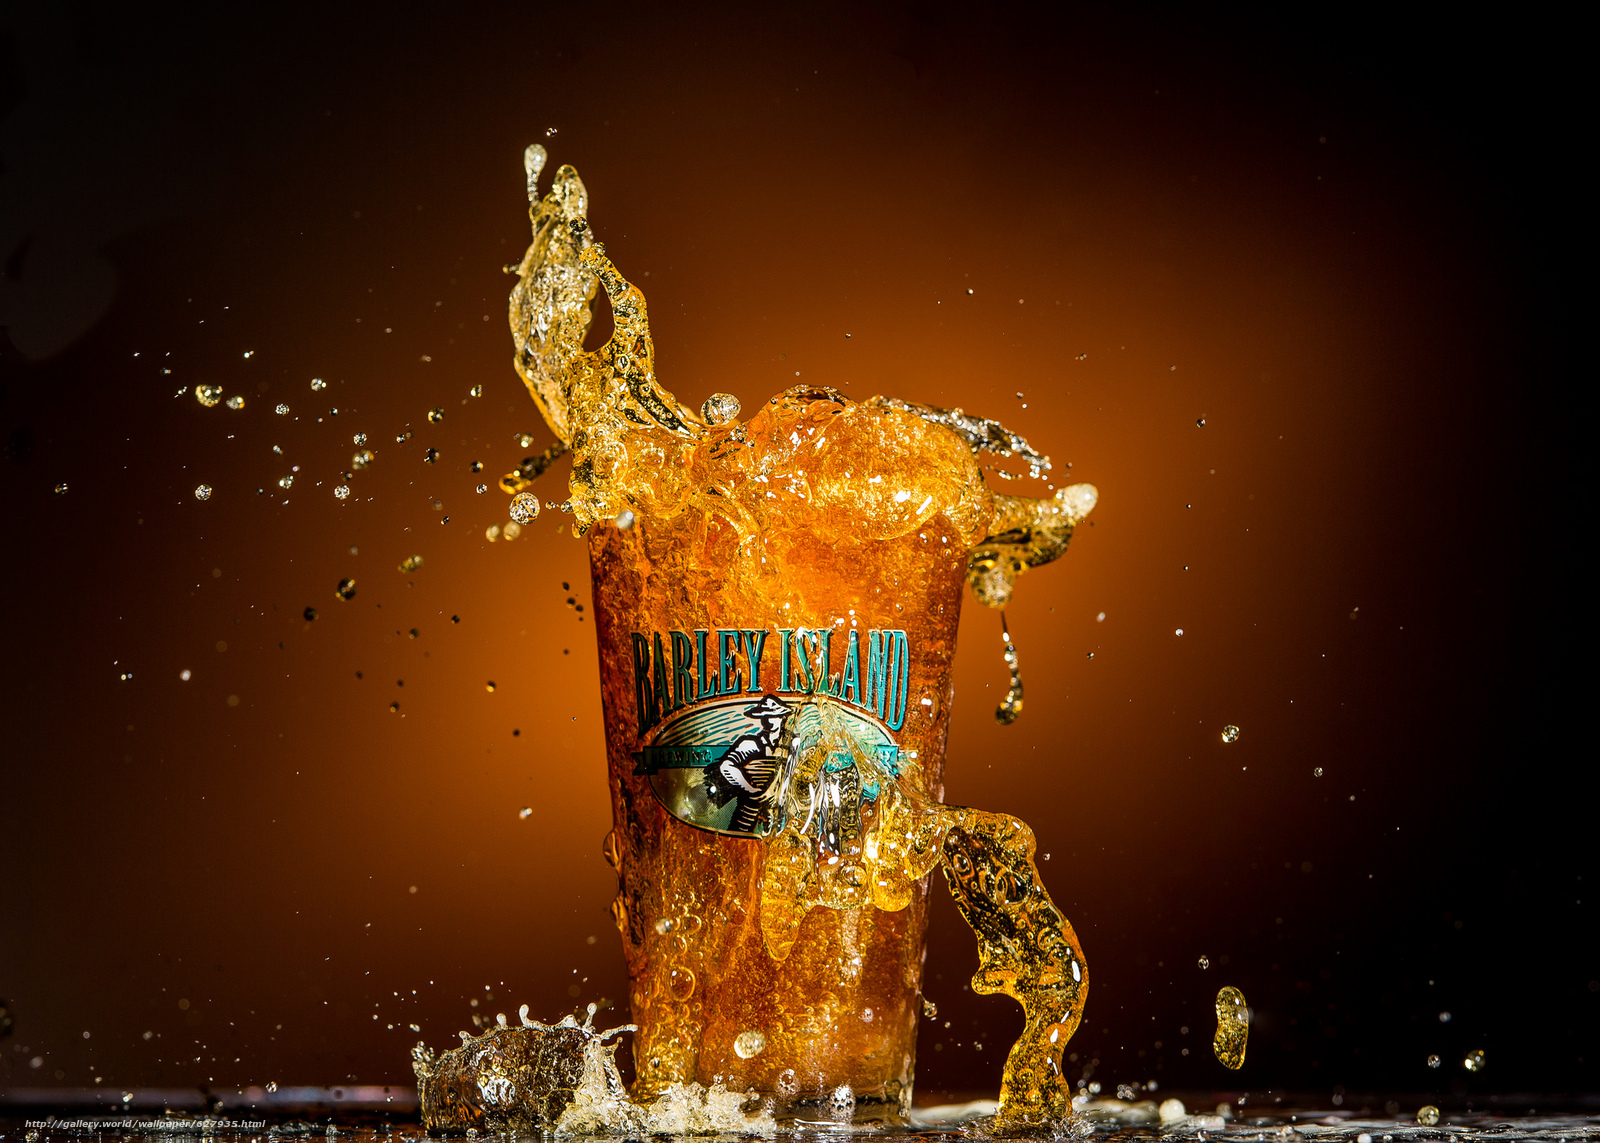 Barley Island Beer, пиво, всплеск, стакан, макро